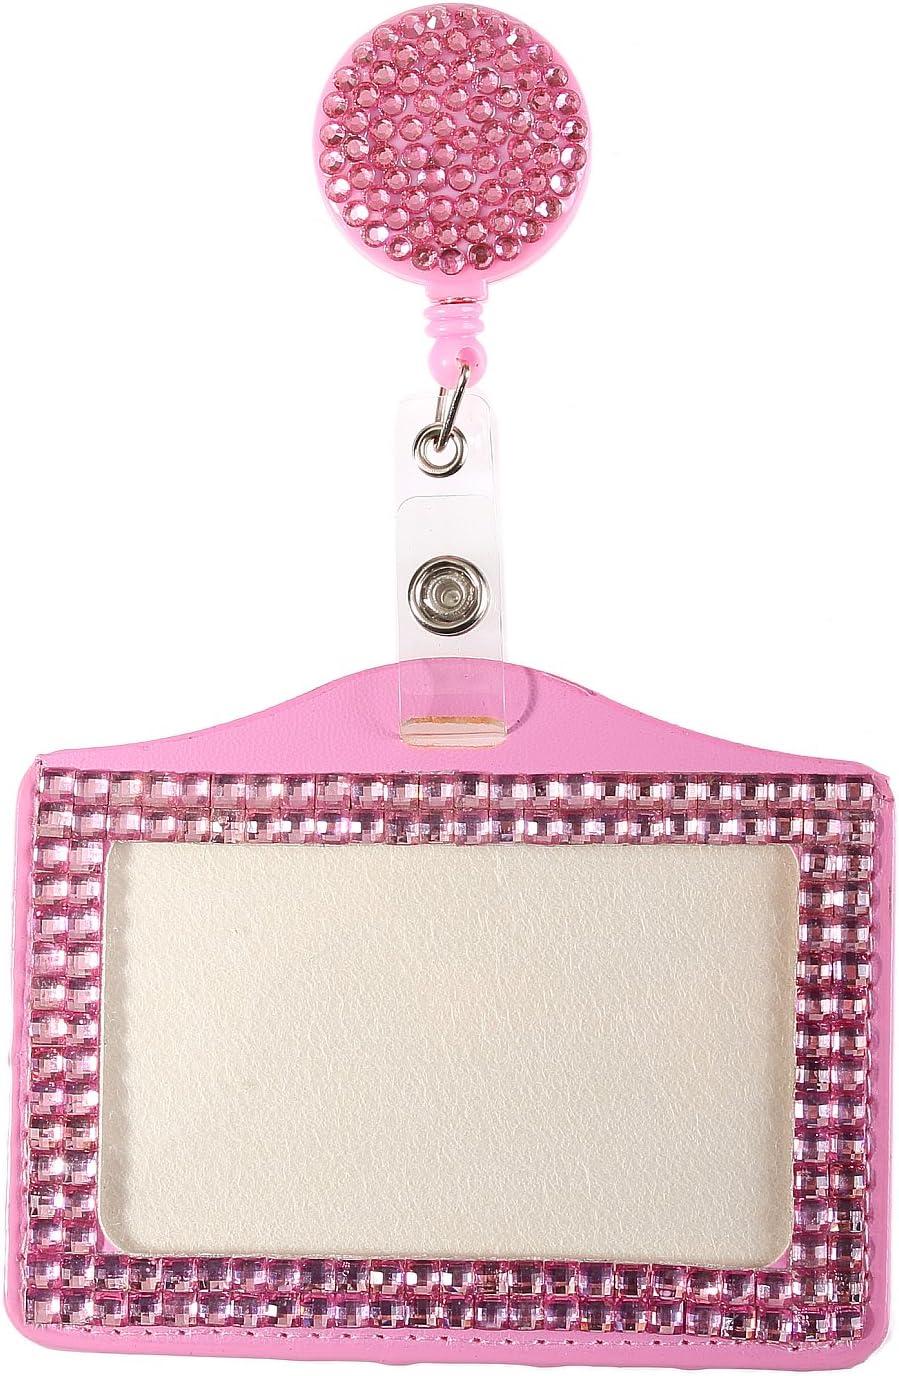 Horizontal Card Holder for Business Id Card Purely Handmade Fashion Baby Pink Bling Crystal Lanyard Cute Rhinestone Badge Reel